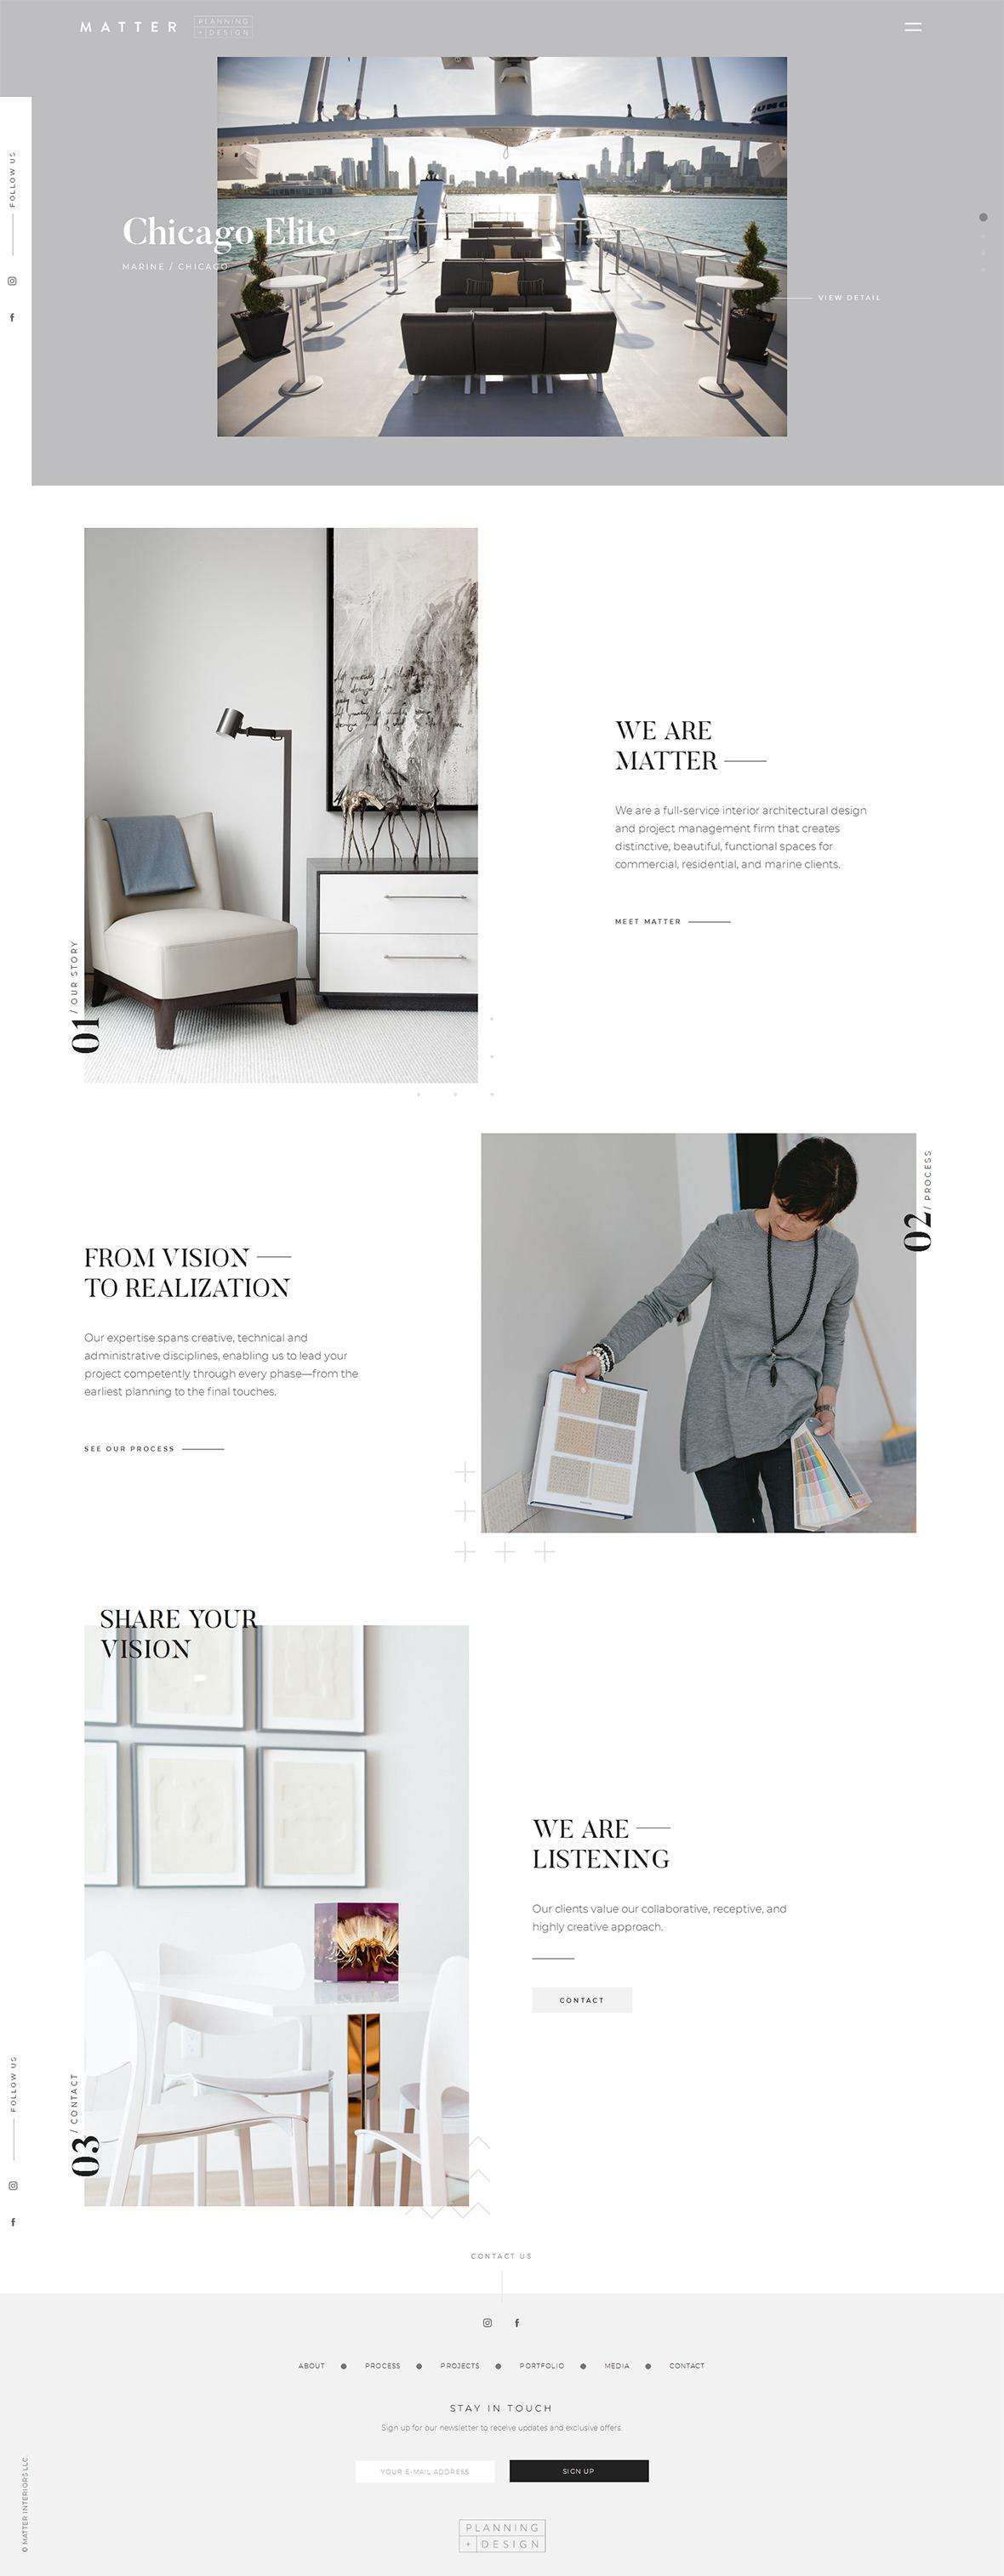 MATTER Planning-创意,网页设计,创意设计,创意网站,字体设计,设计网站,设计作品,网站欣赏,优,ui设计,设计,设计师,平面设计,电商设计,动漫设计,网站设计